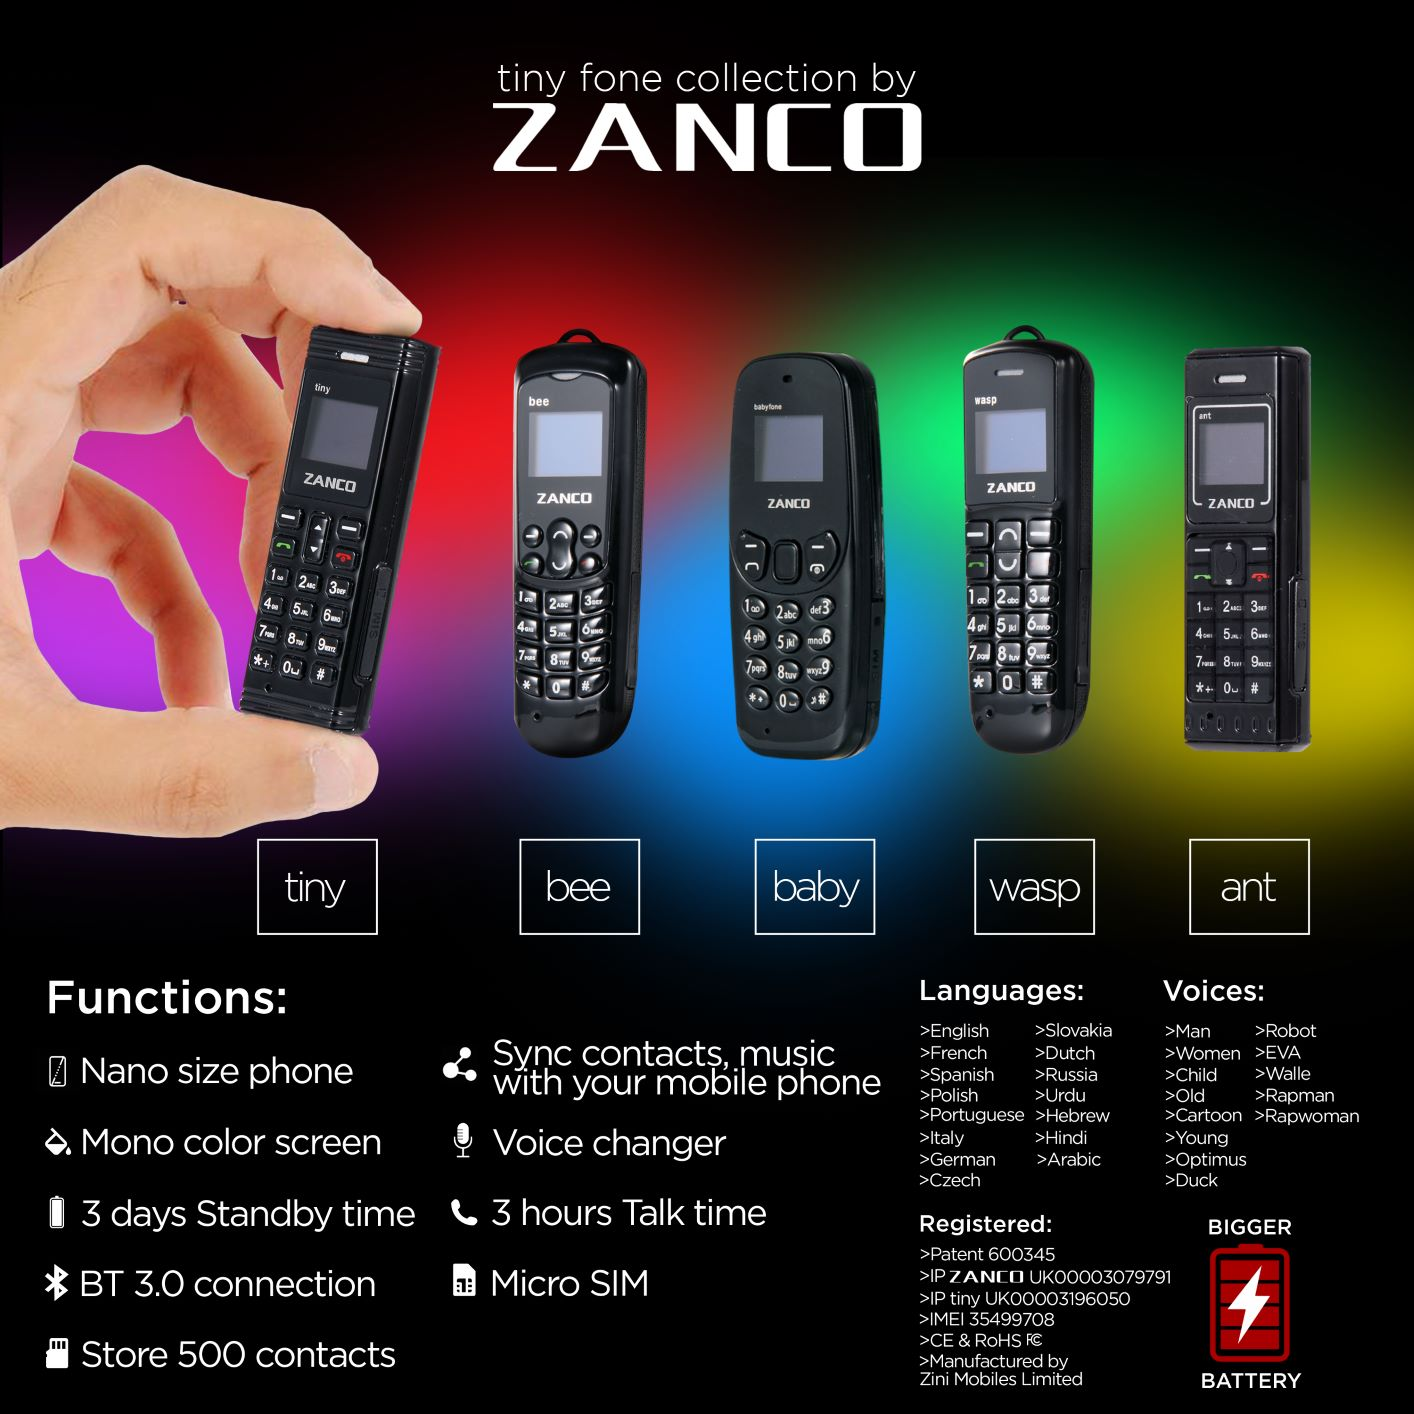 ZANCO x 100 tiny fone collection mixed zanco mini phones cellular phone unlocked cell phone Buy factory direct